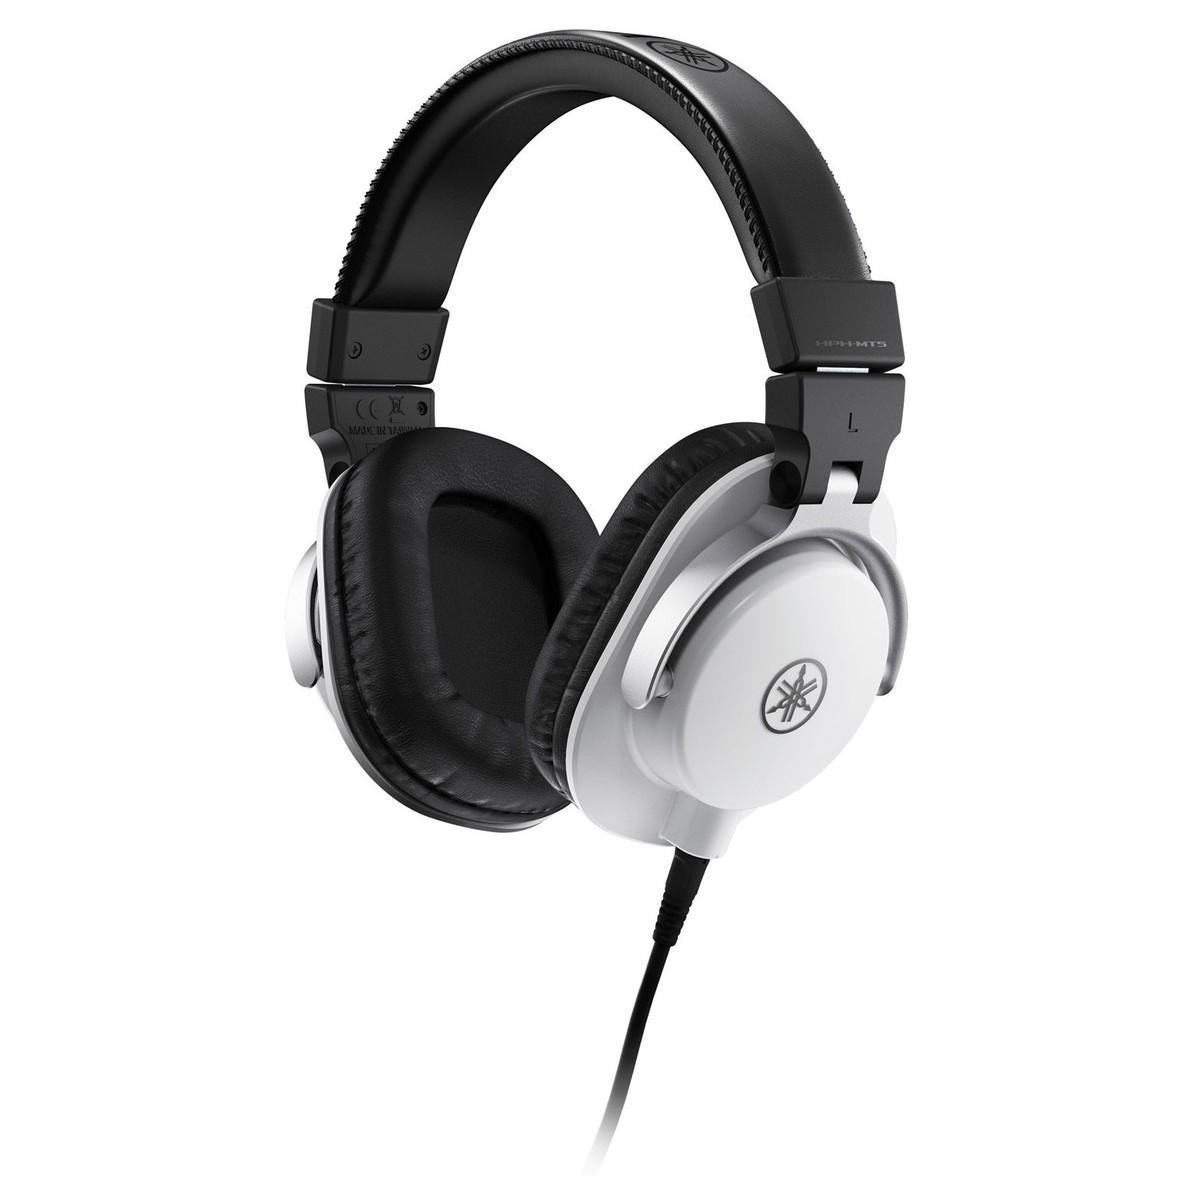 yamaha hph mt5 studio monitor headphones white at. Black Bedroom Furniture Sets. Home Design Ideas